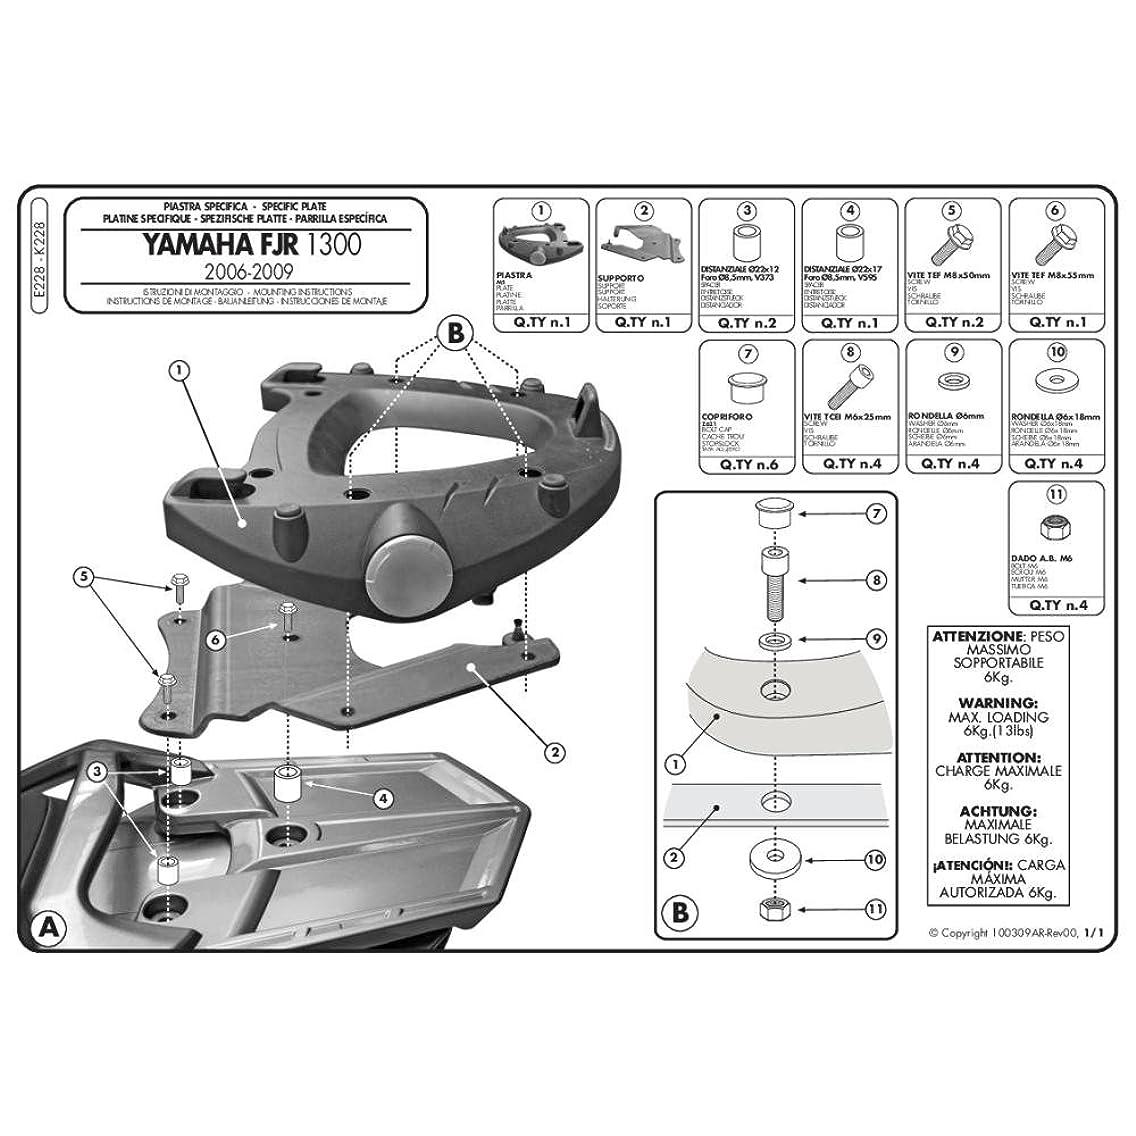 GIVI E228 Monokey Topcase Mounting Kit-Yamaha FJR1300 (06-15)